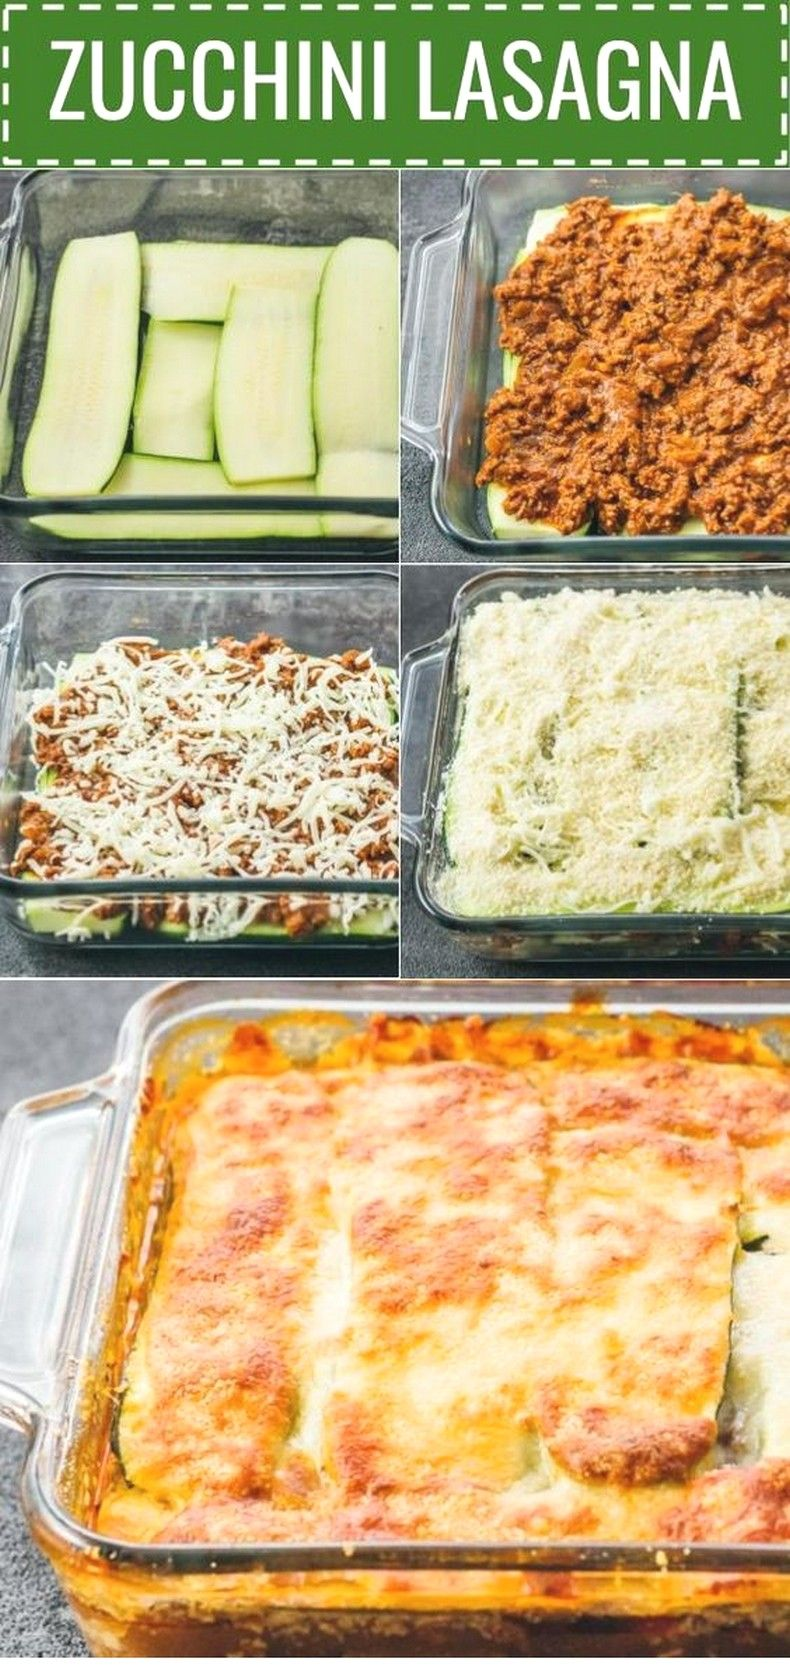 Zucchini Lasagna With Ground Beef Recipe Keto Recipes Dinner Ground Beef Keto Recipes Keto Recipes Easy